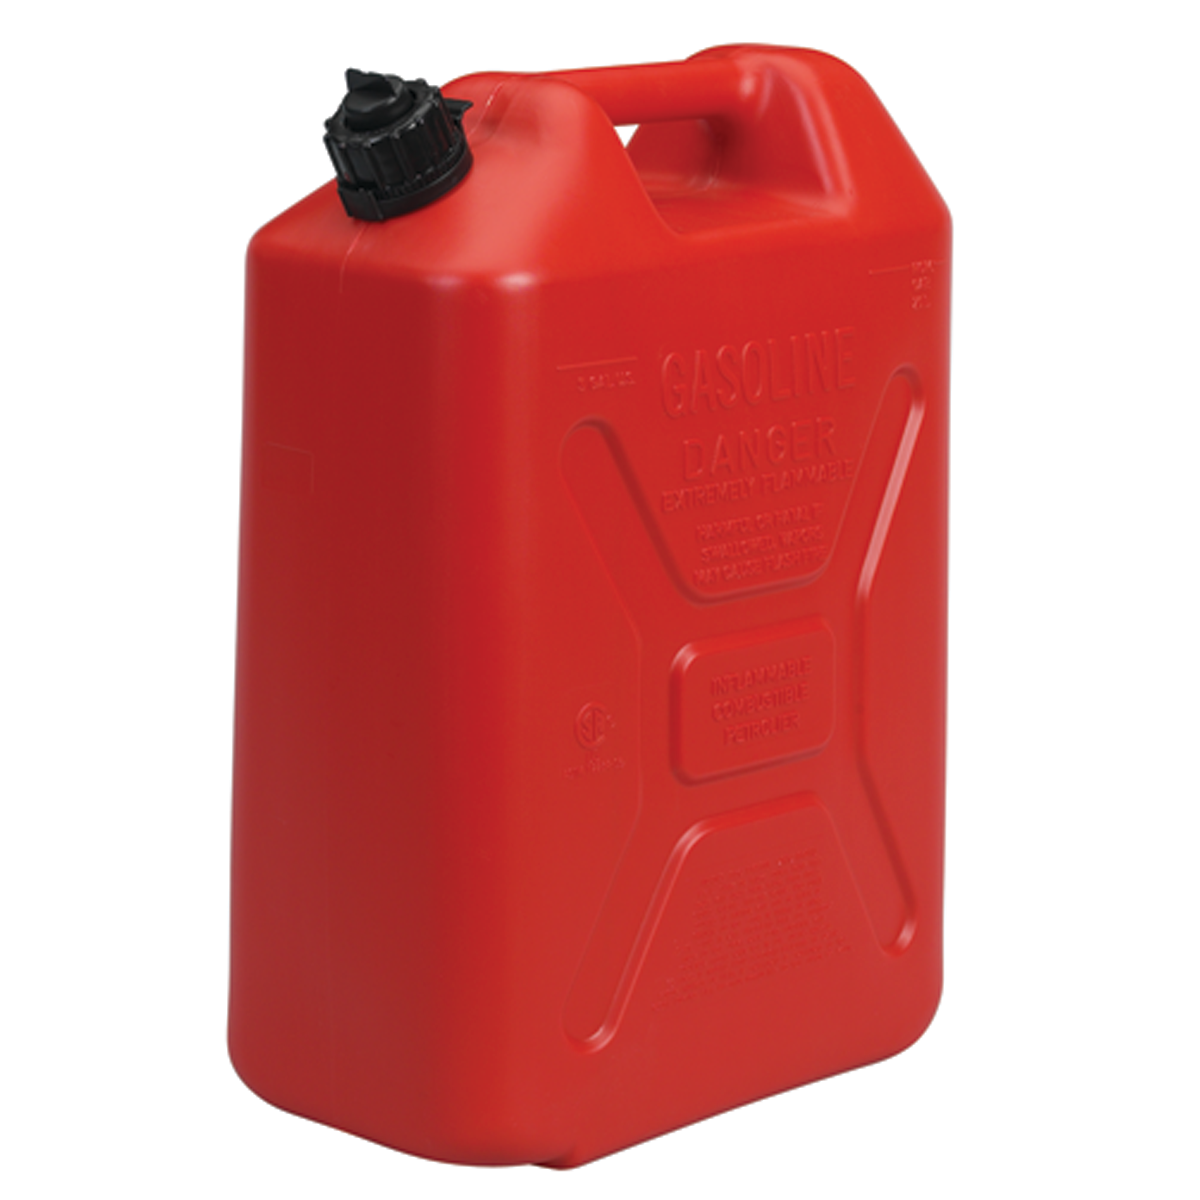 Fuel Tanks -AMPAND- Accessories